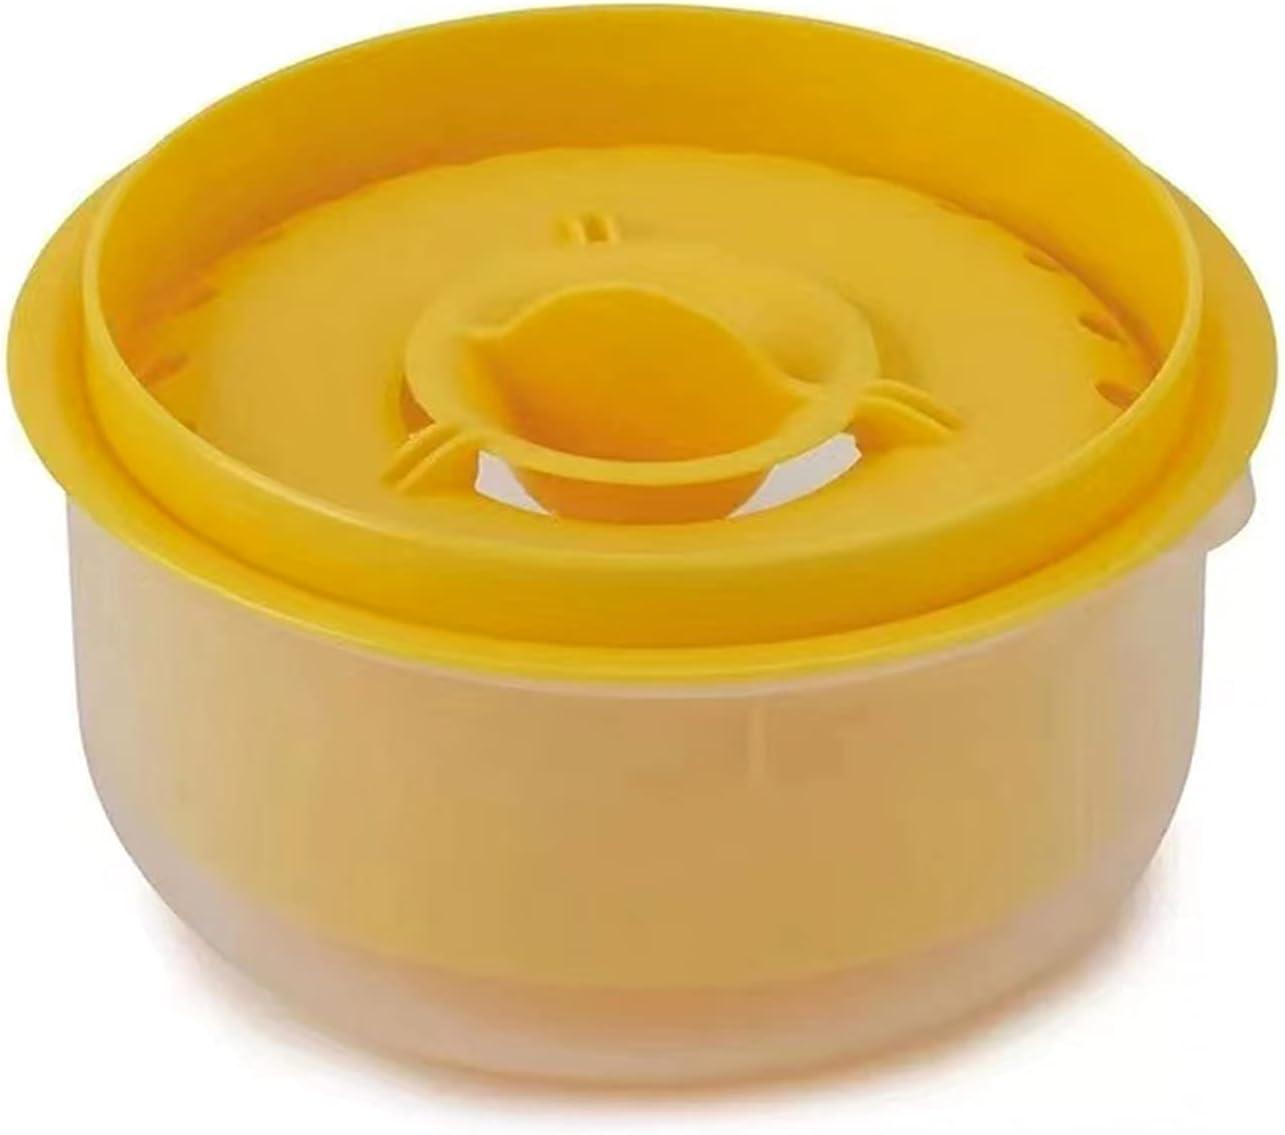 Egg Separator Plastic White Tulsa Mall Yolk Separ Genuine Free Shipping